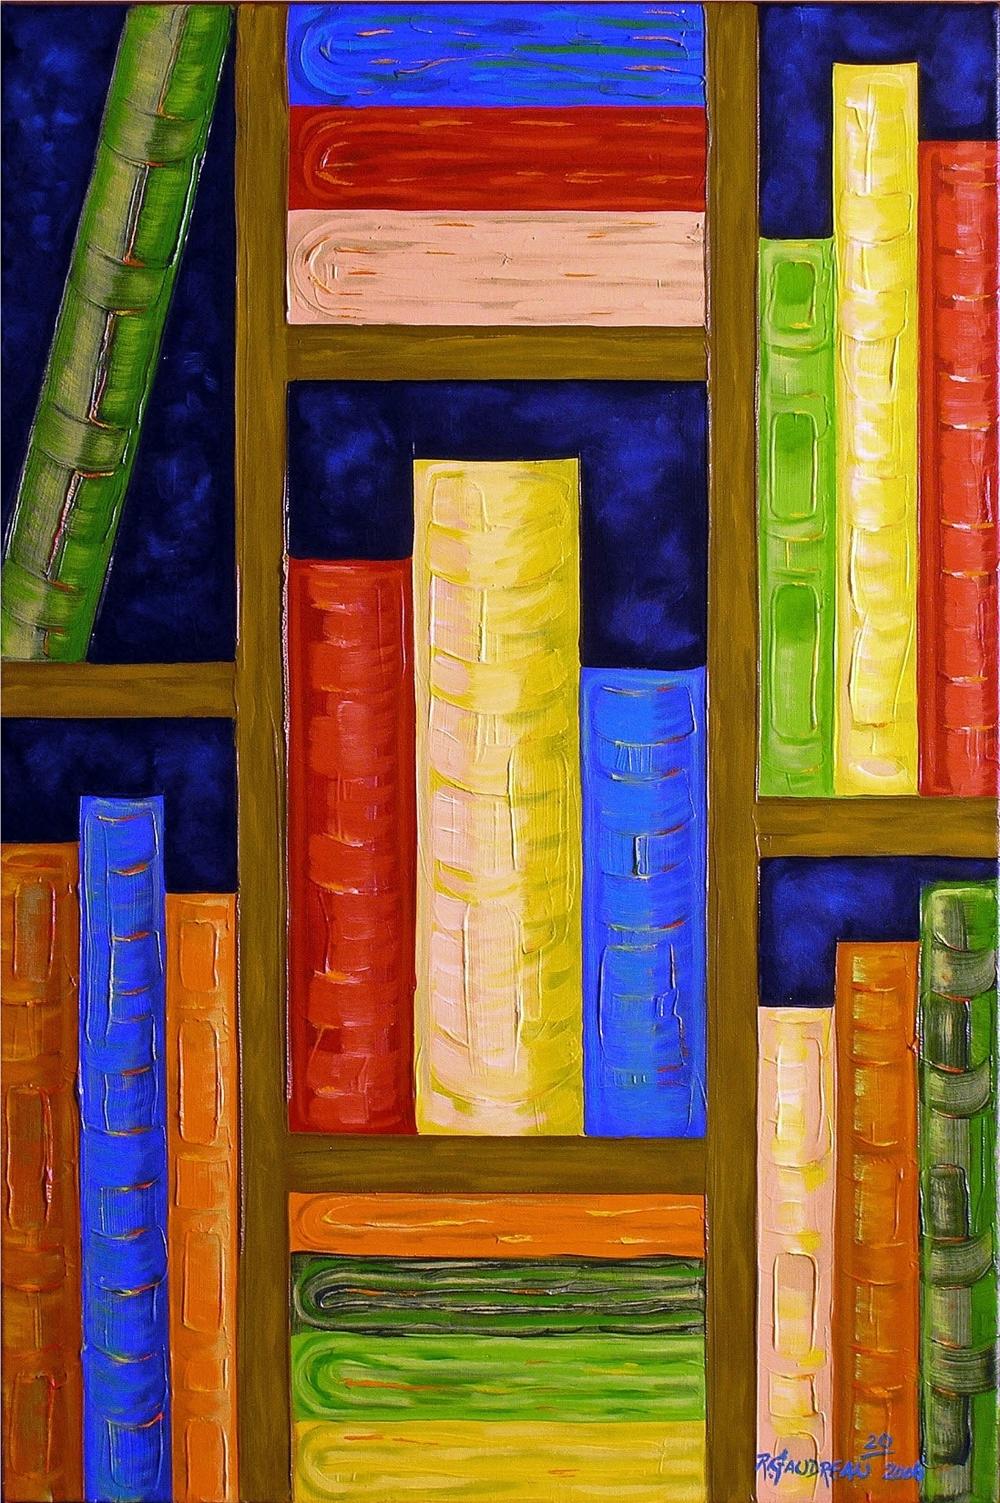 1250 20 Books Max pxl MasterJPG.jpg